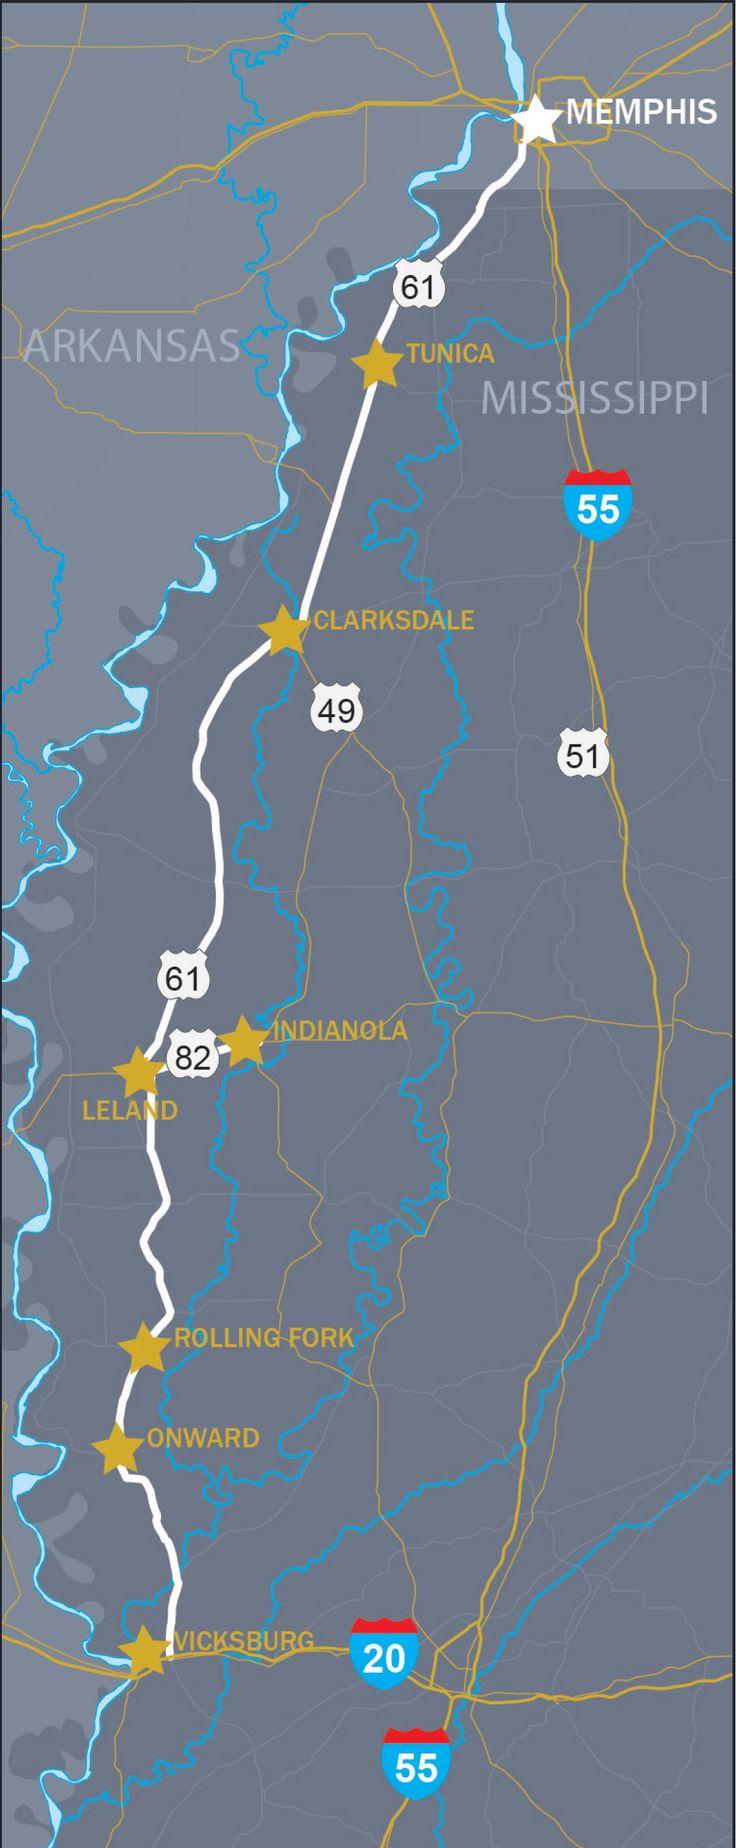 Road Trip from Memphis to Vicksburg Through